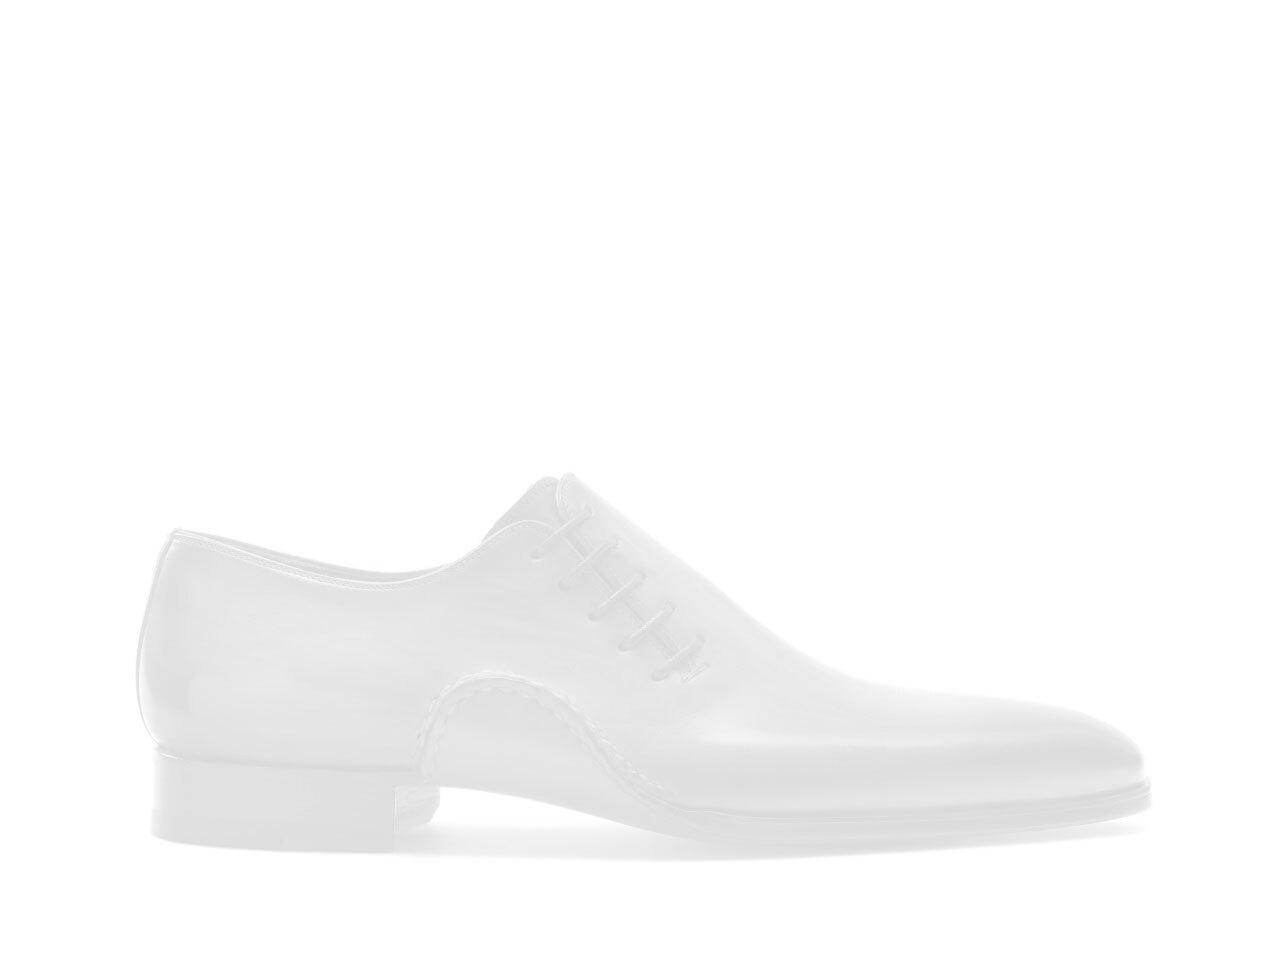 Pair of the Magnanni Deza Brown Men's Double Monk Strap Shoes